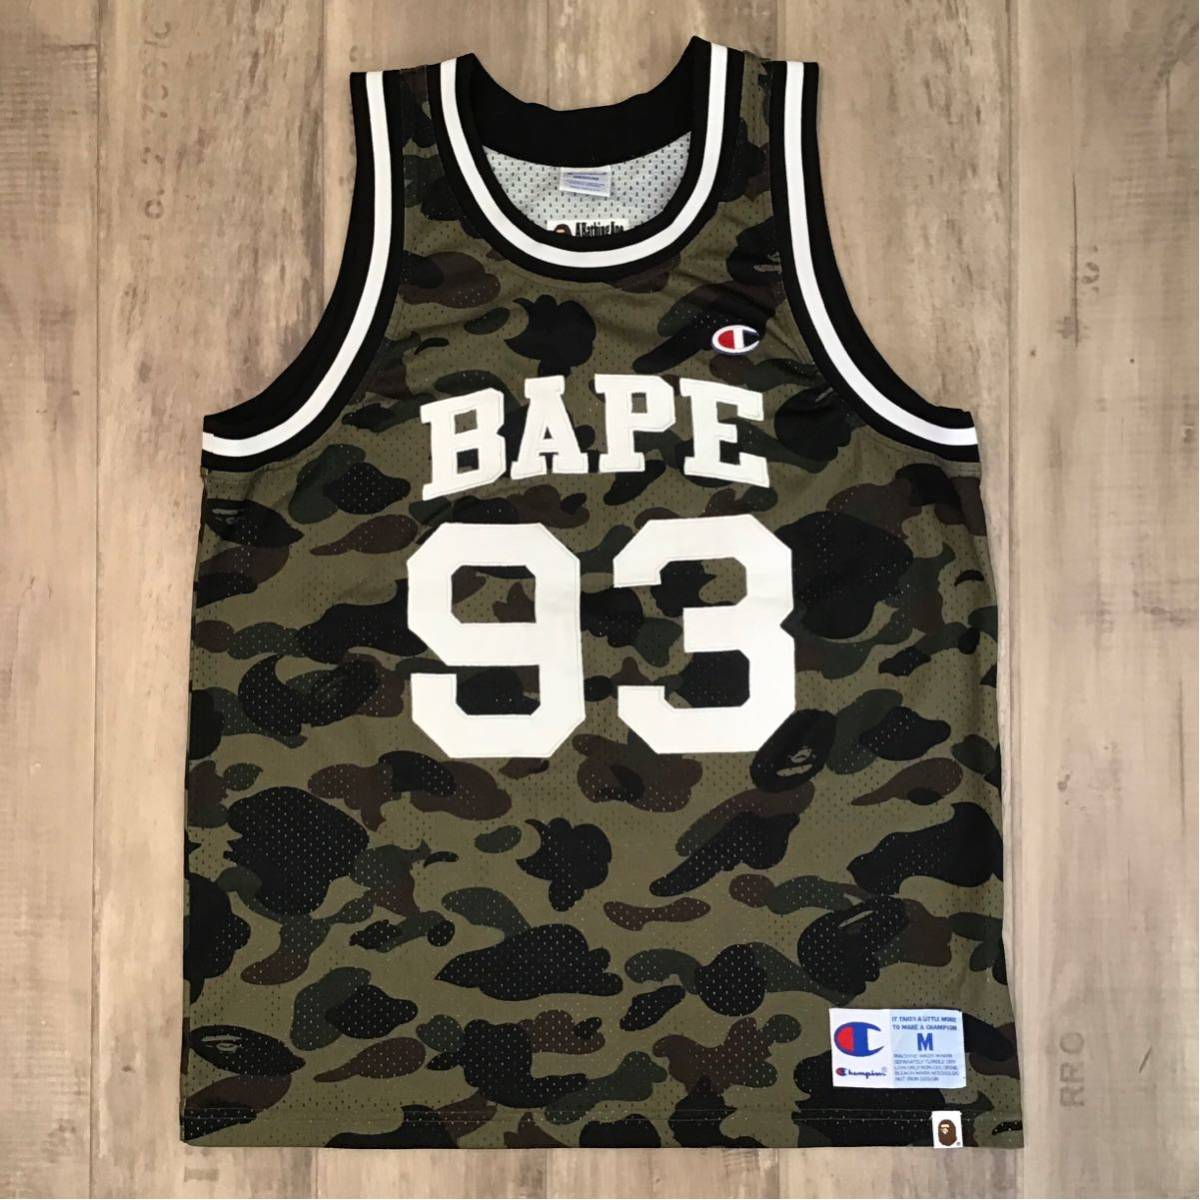 champion × BAPE basketball tank top Mサイズ a bathing ape BAPE タンクトップ エイプ ベイプ アベイシングエイプ チャンピオン 迷彩